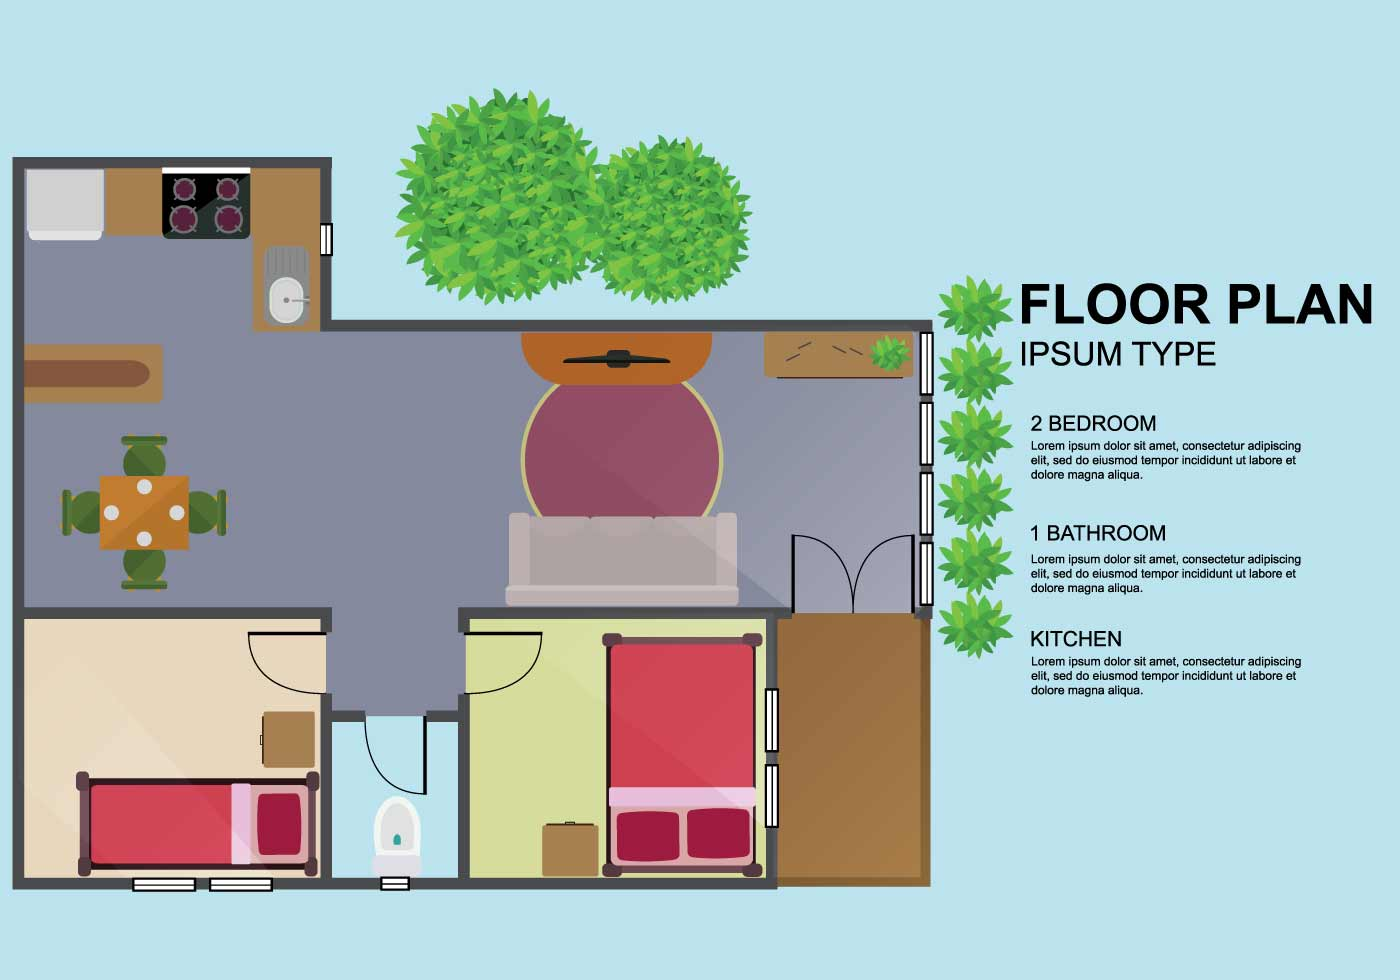 Free floorplan illustration download free vector art - Floor plan online free ...